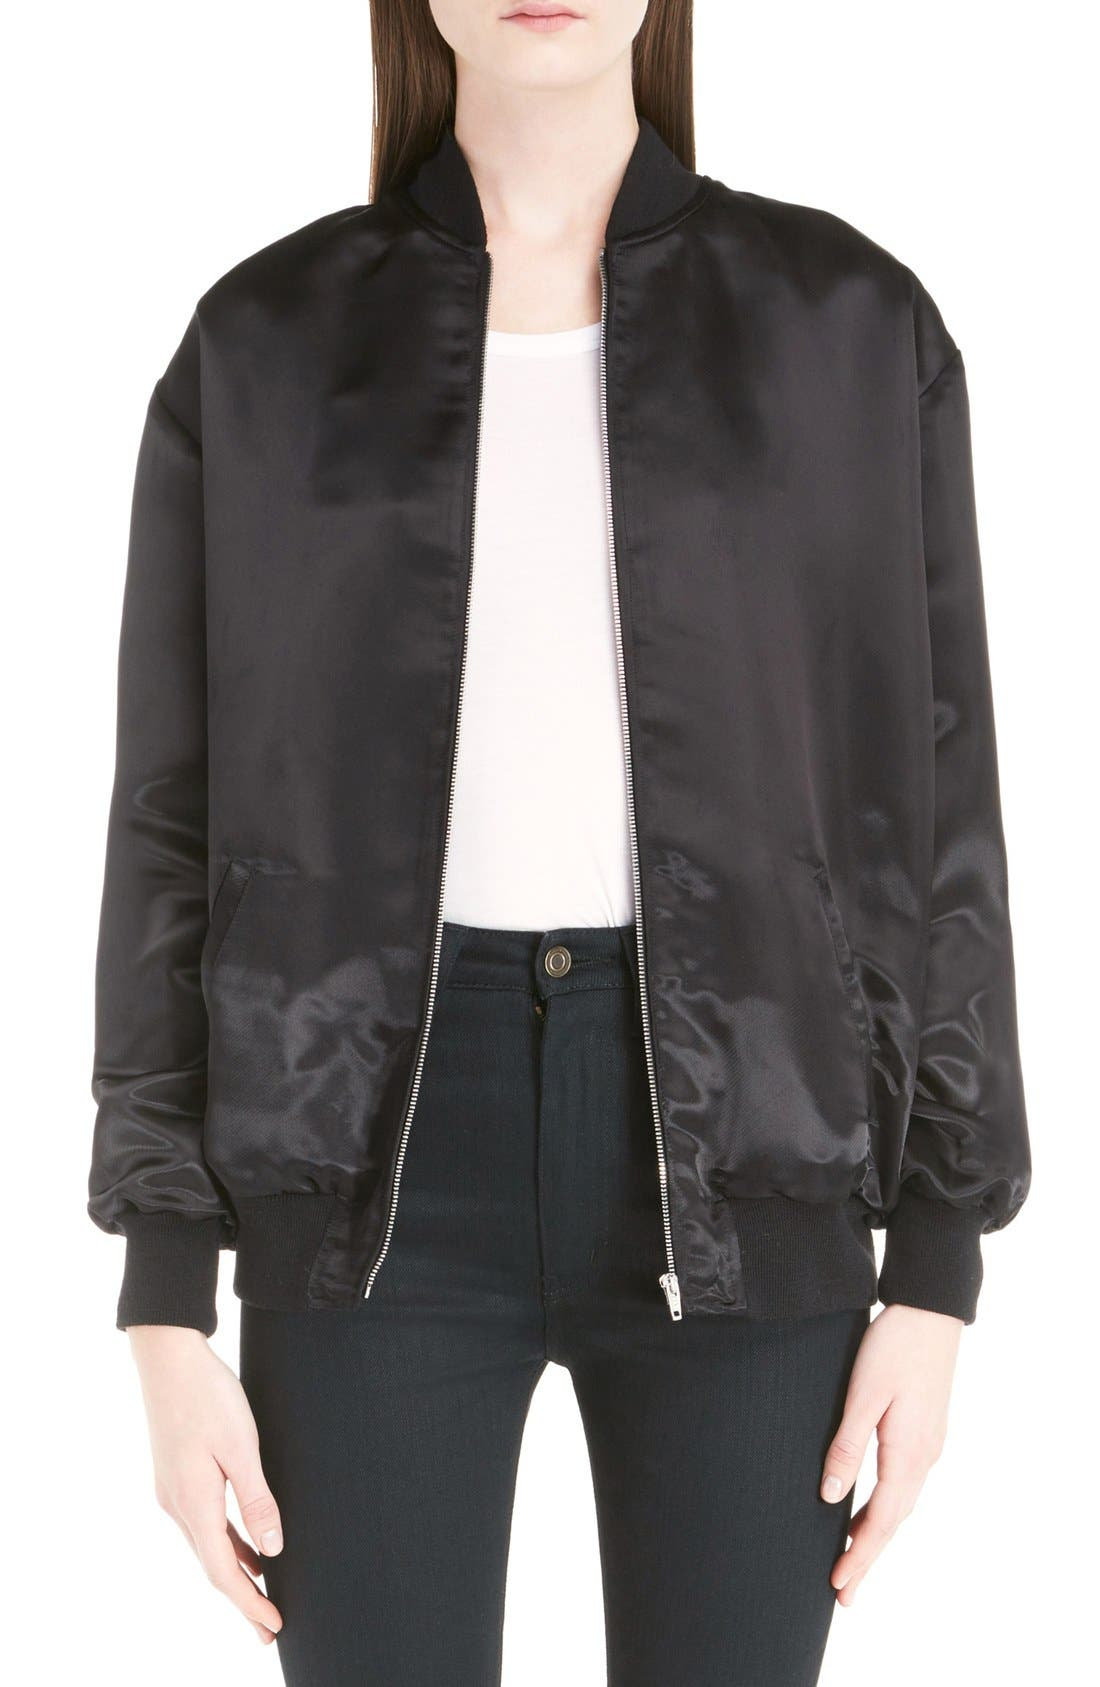 Alternate Image 2  - Saint Laurent 'Teddy' Oversize Patch Satin Bomber Jacket